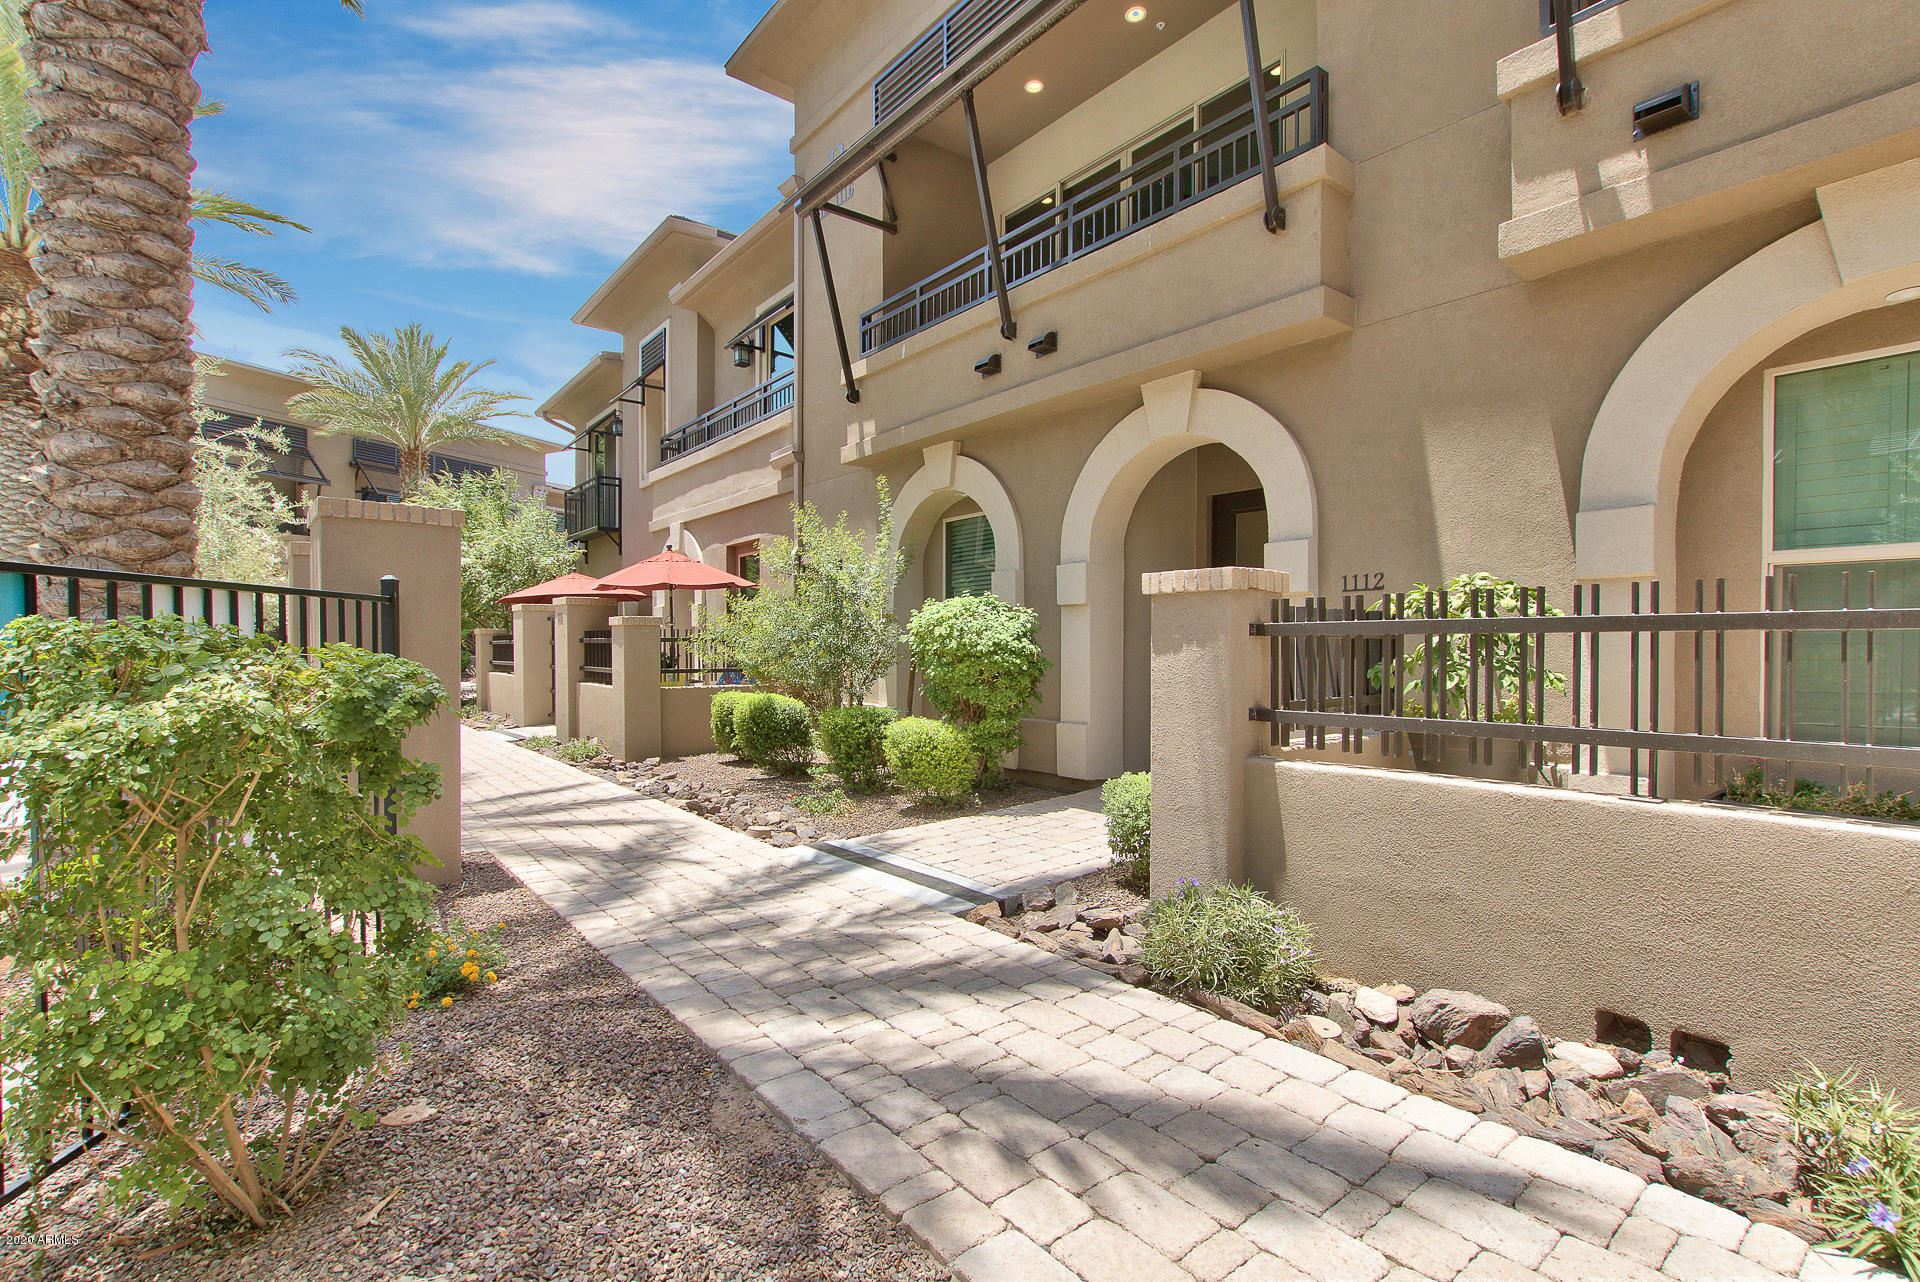 6565 E THOMAS Road #1112, Scottsdale, AZ 85251 - MLS#: 6098956